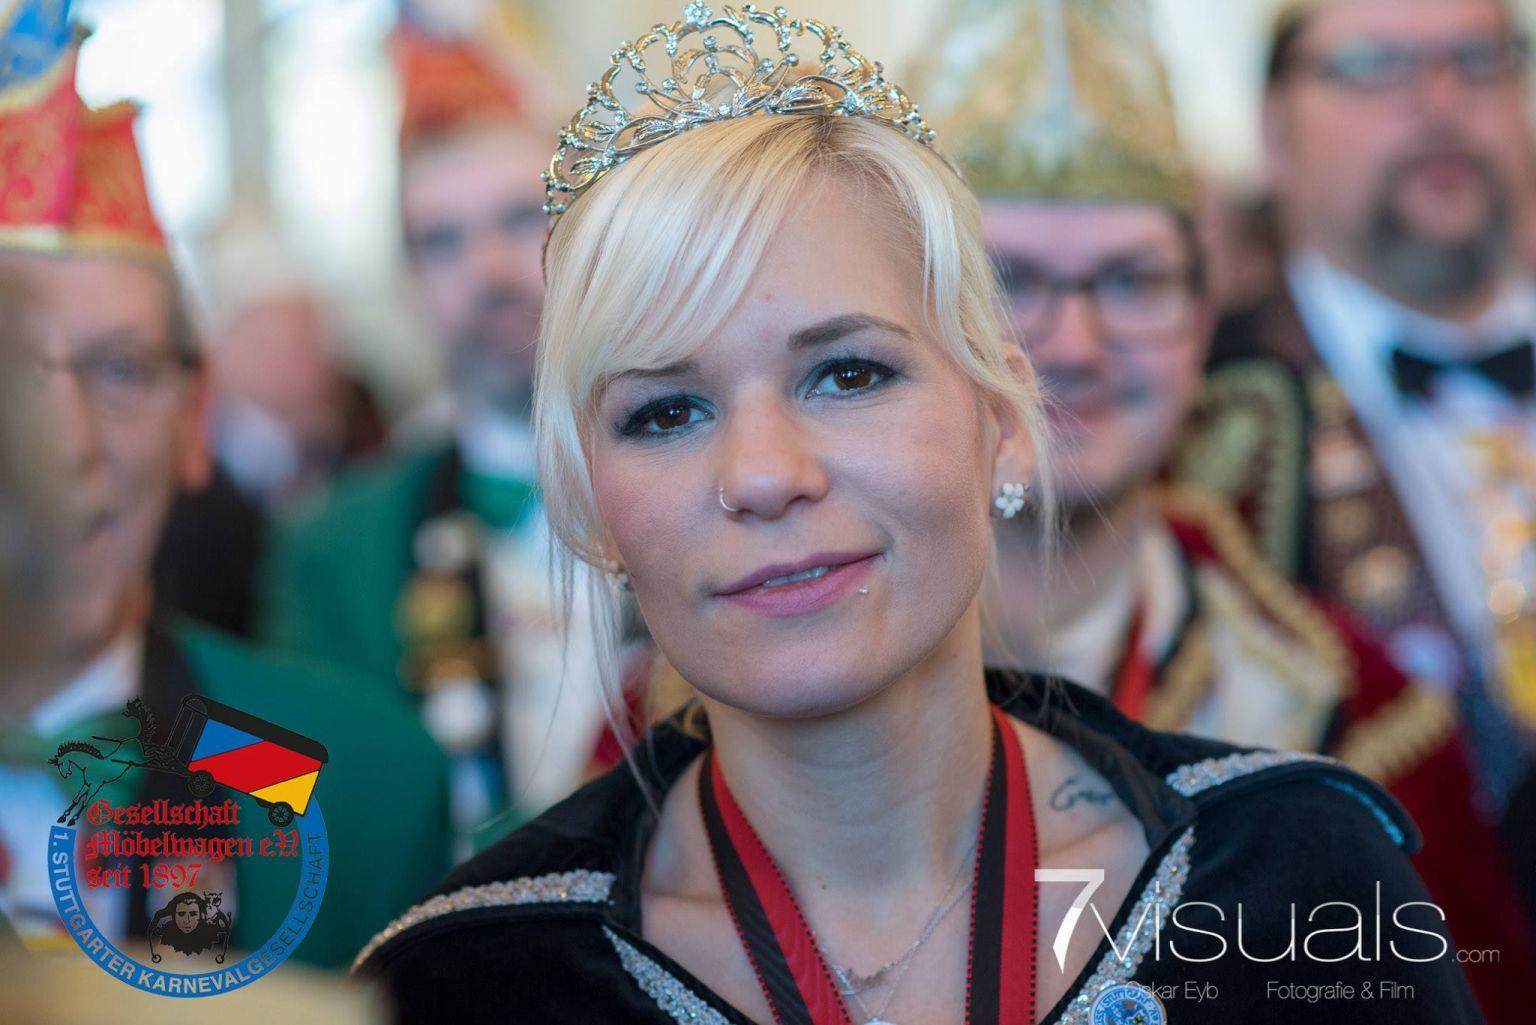 mw-empfang-minister-strobl-2018-010.jpg